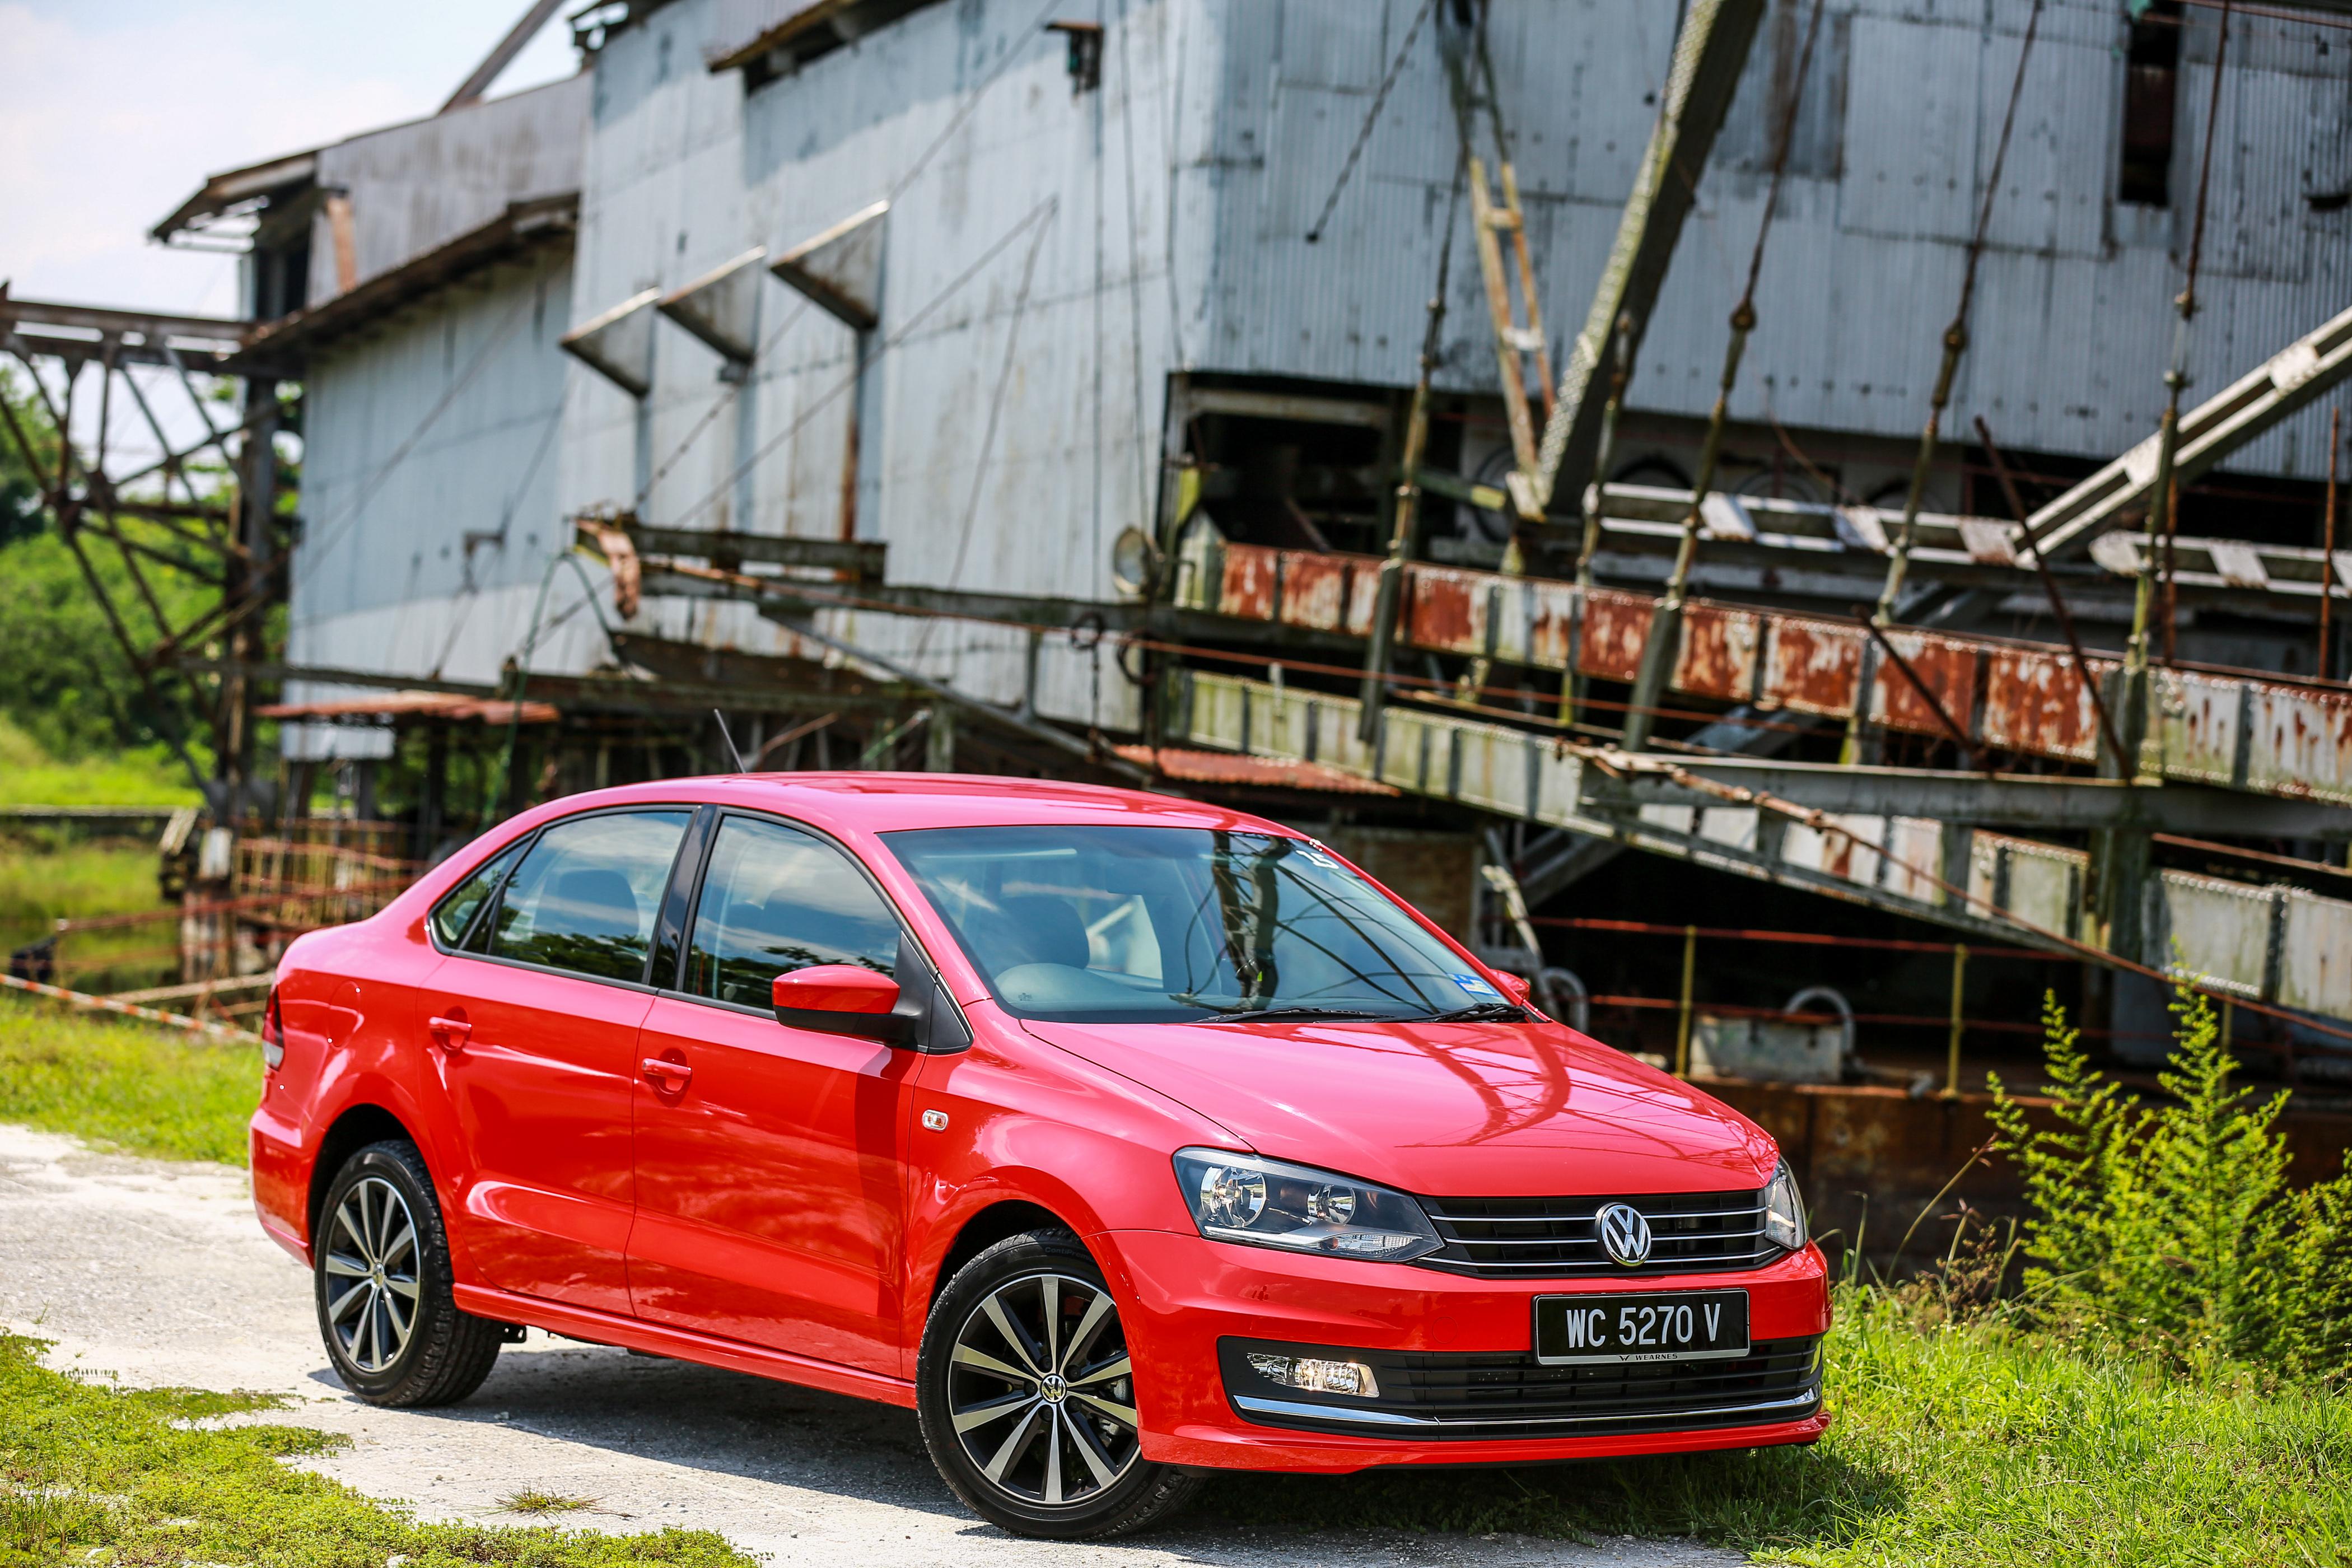 VW Introduces 3-Year Free Maintenance Programme – Piston.my